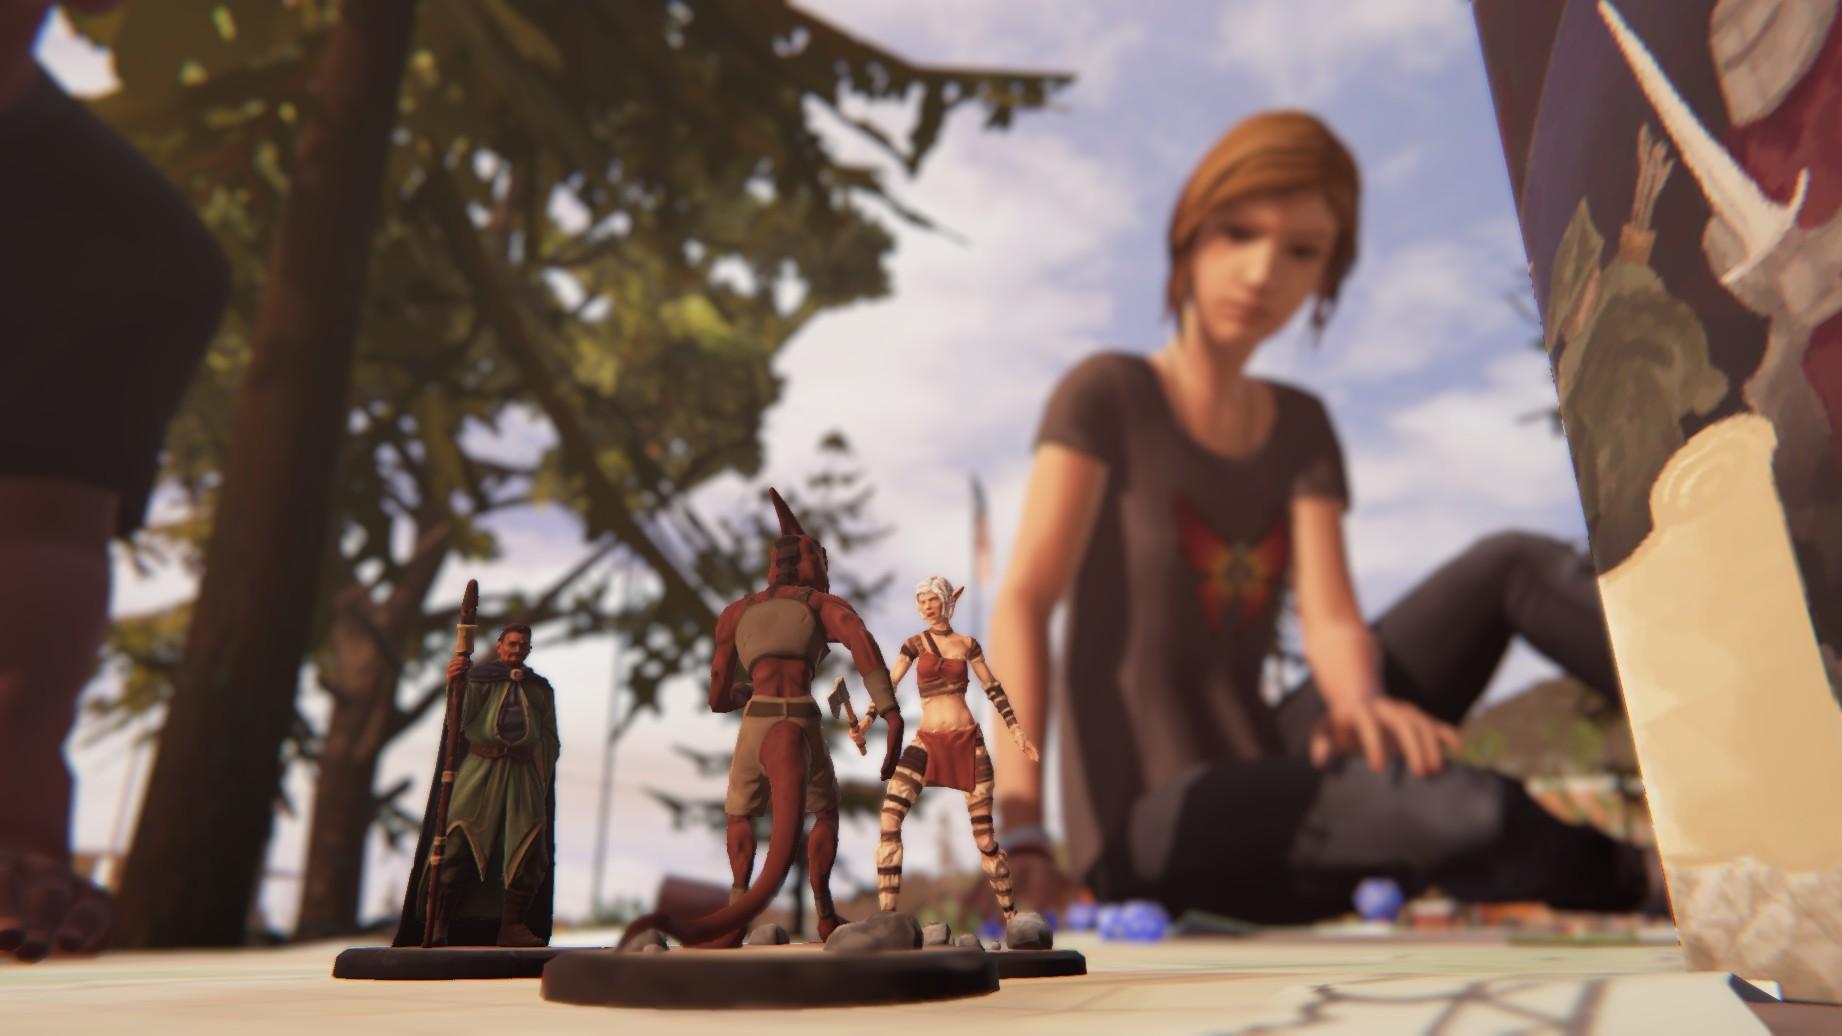 D&D LiS - Life is Strange: Before the Storm Chloe, D&D